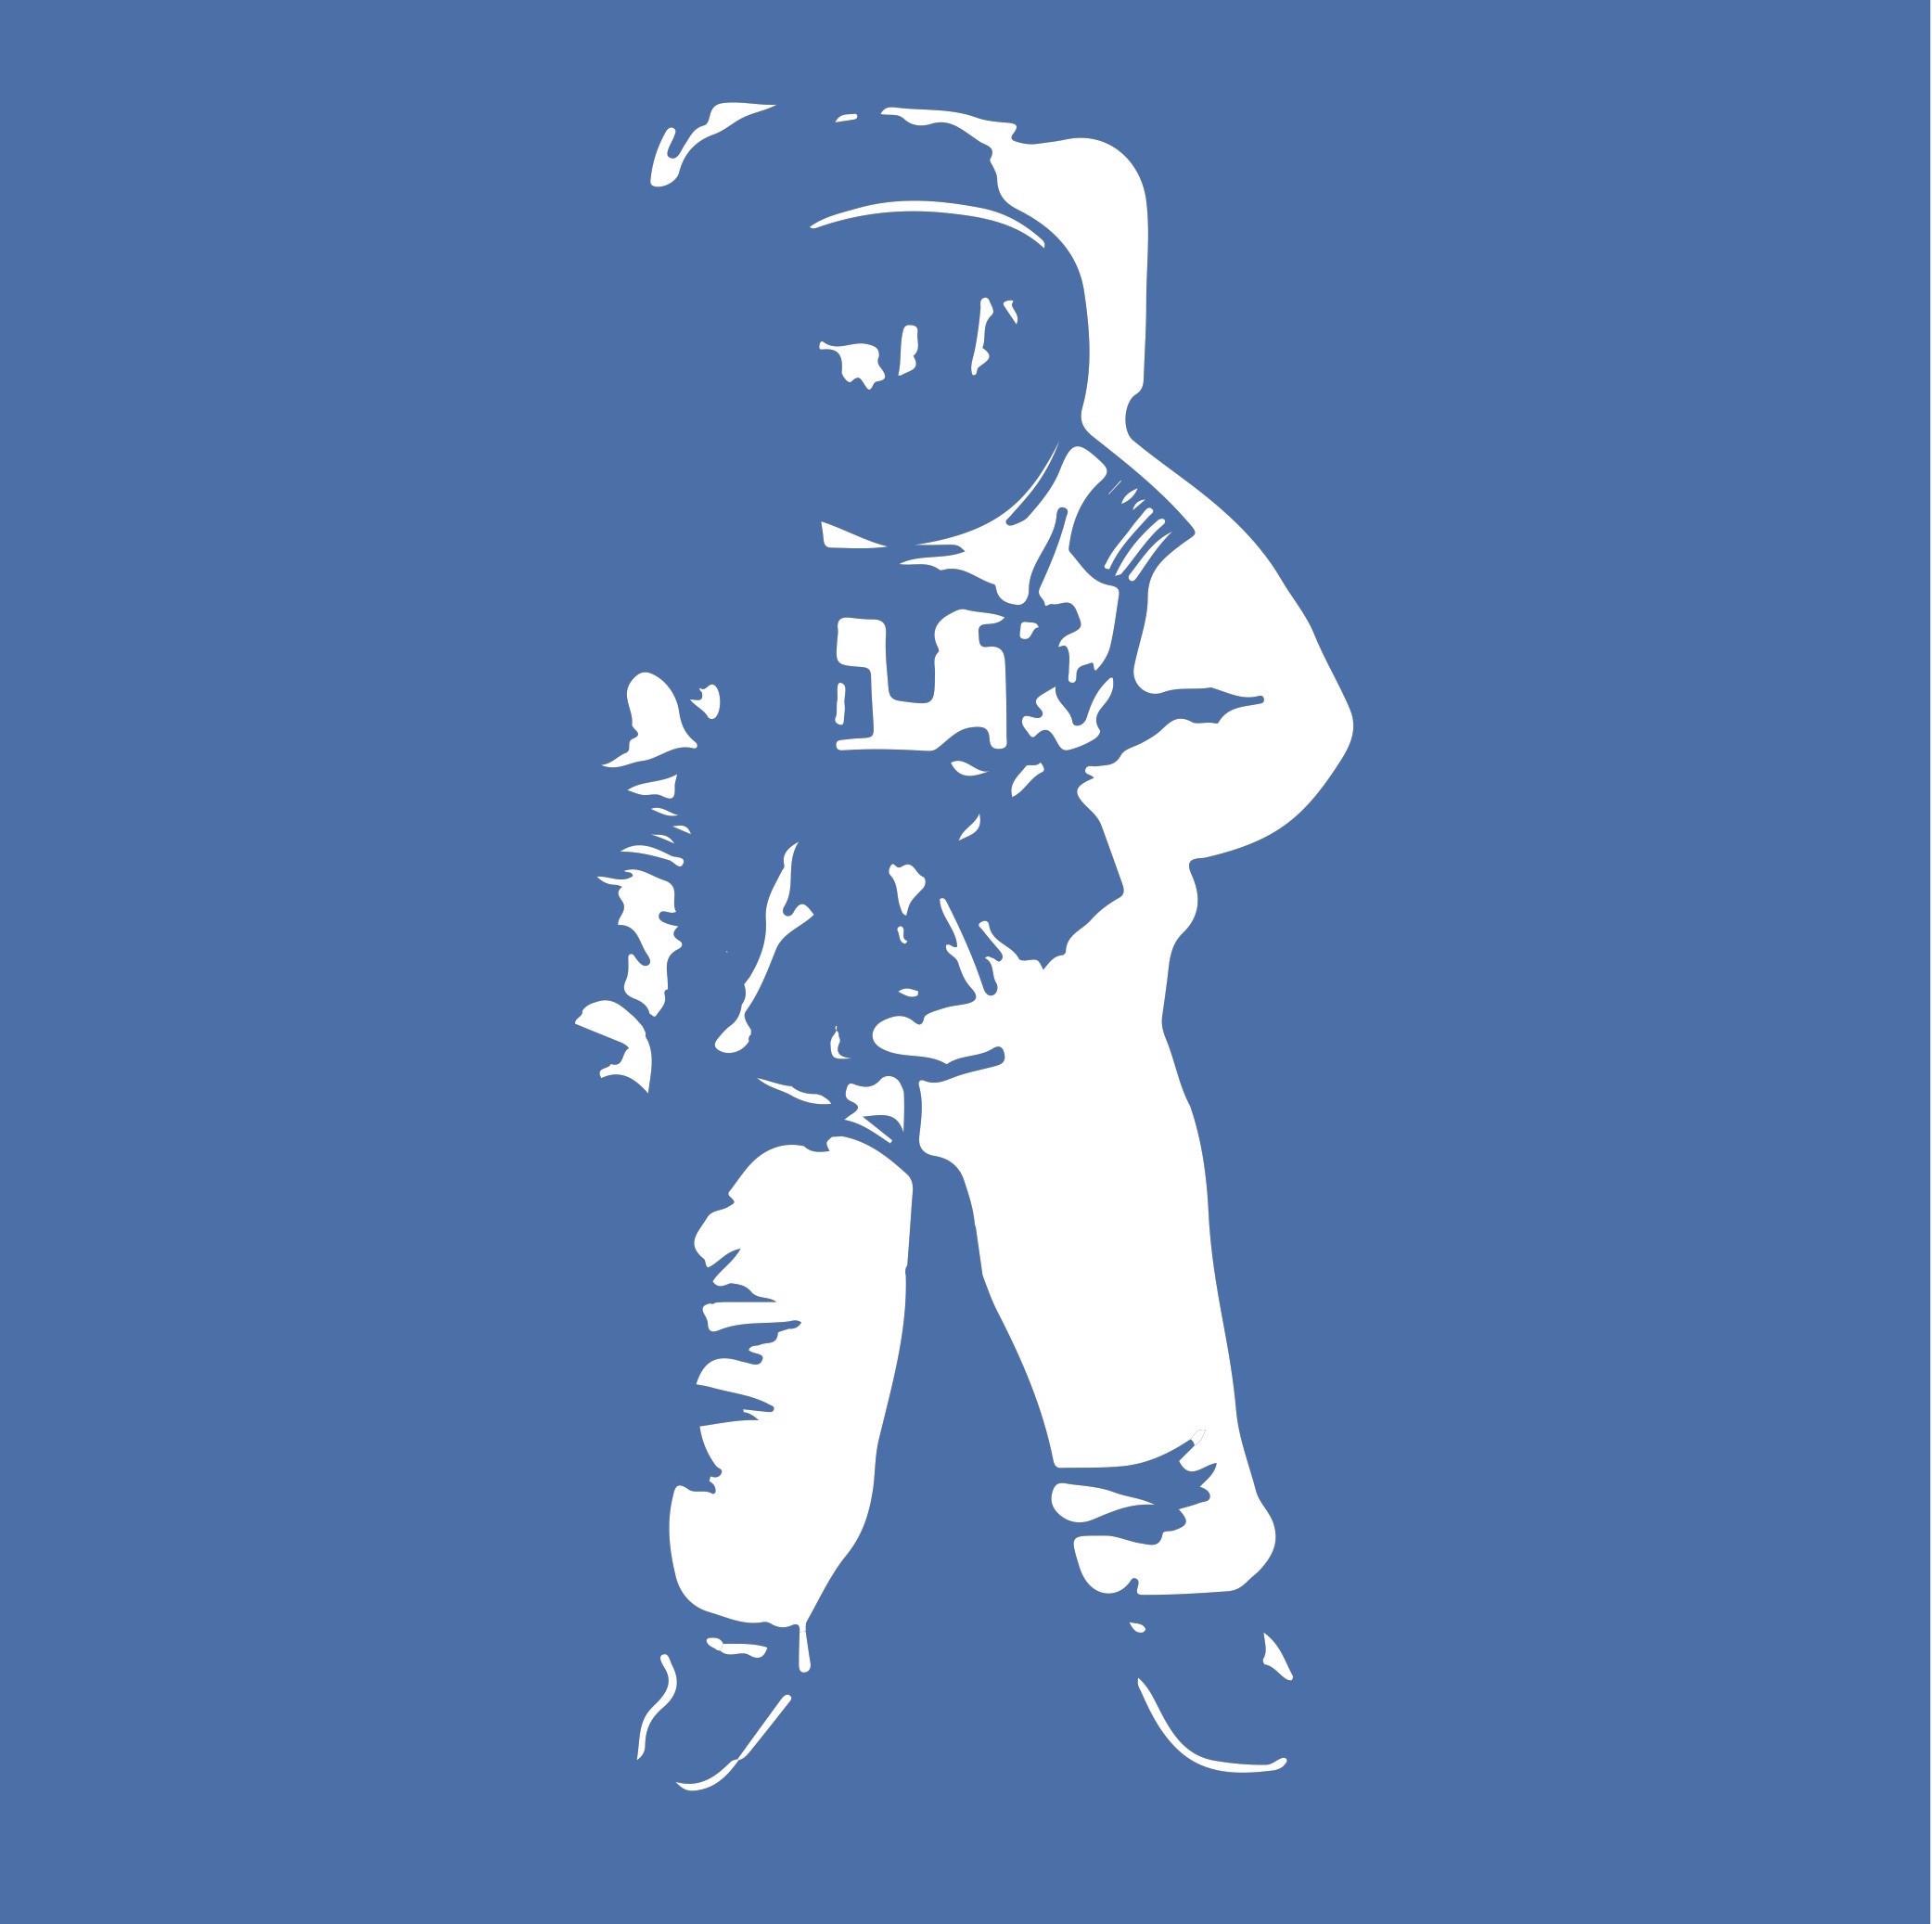 Astronaut Technologies